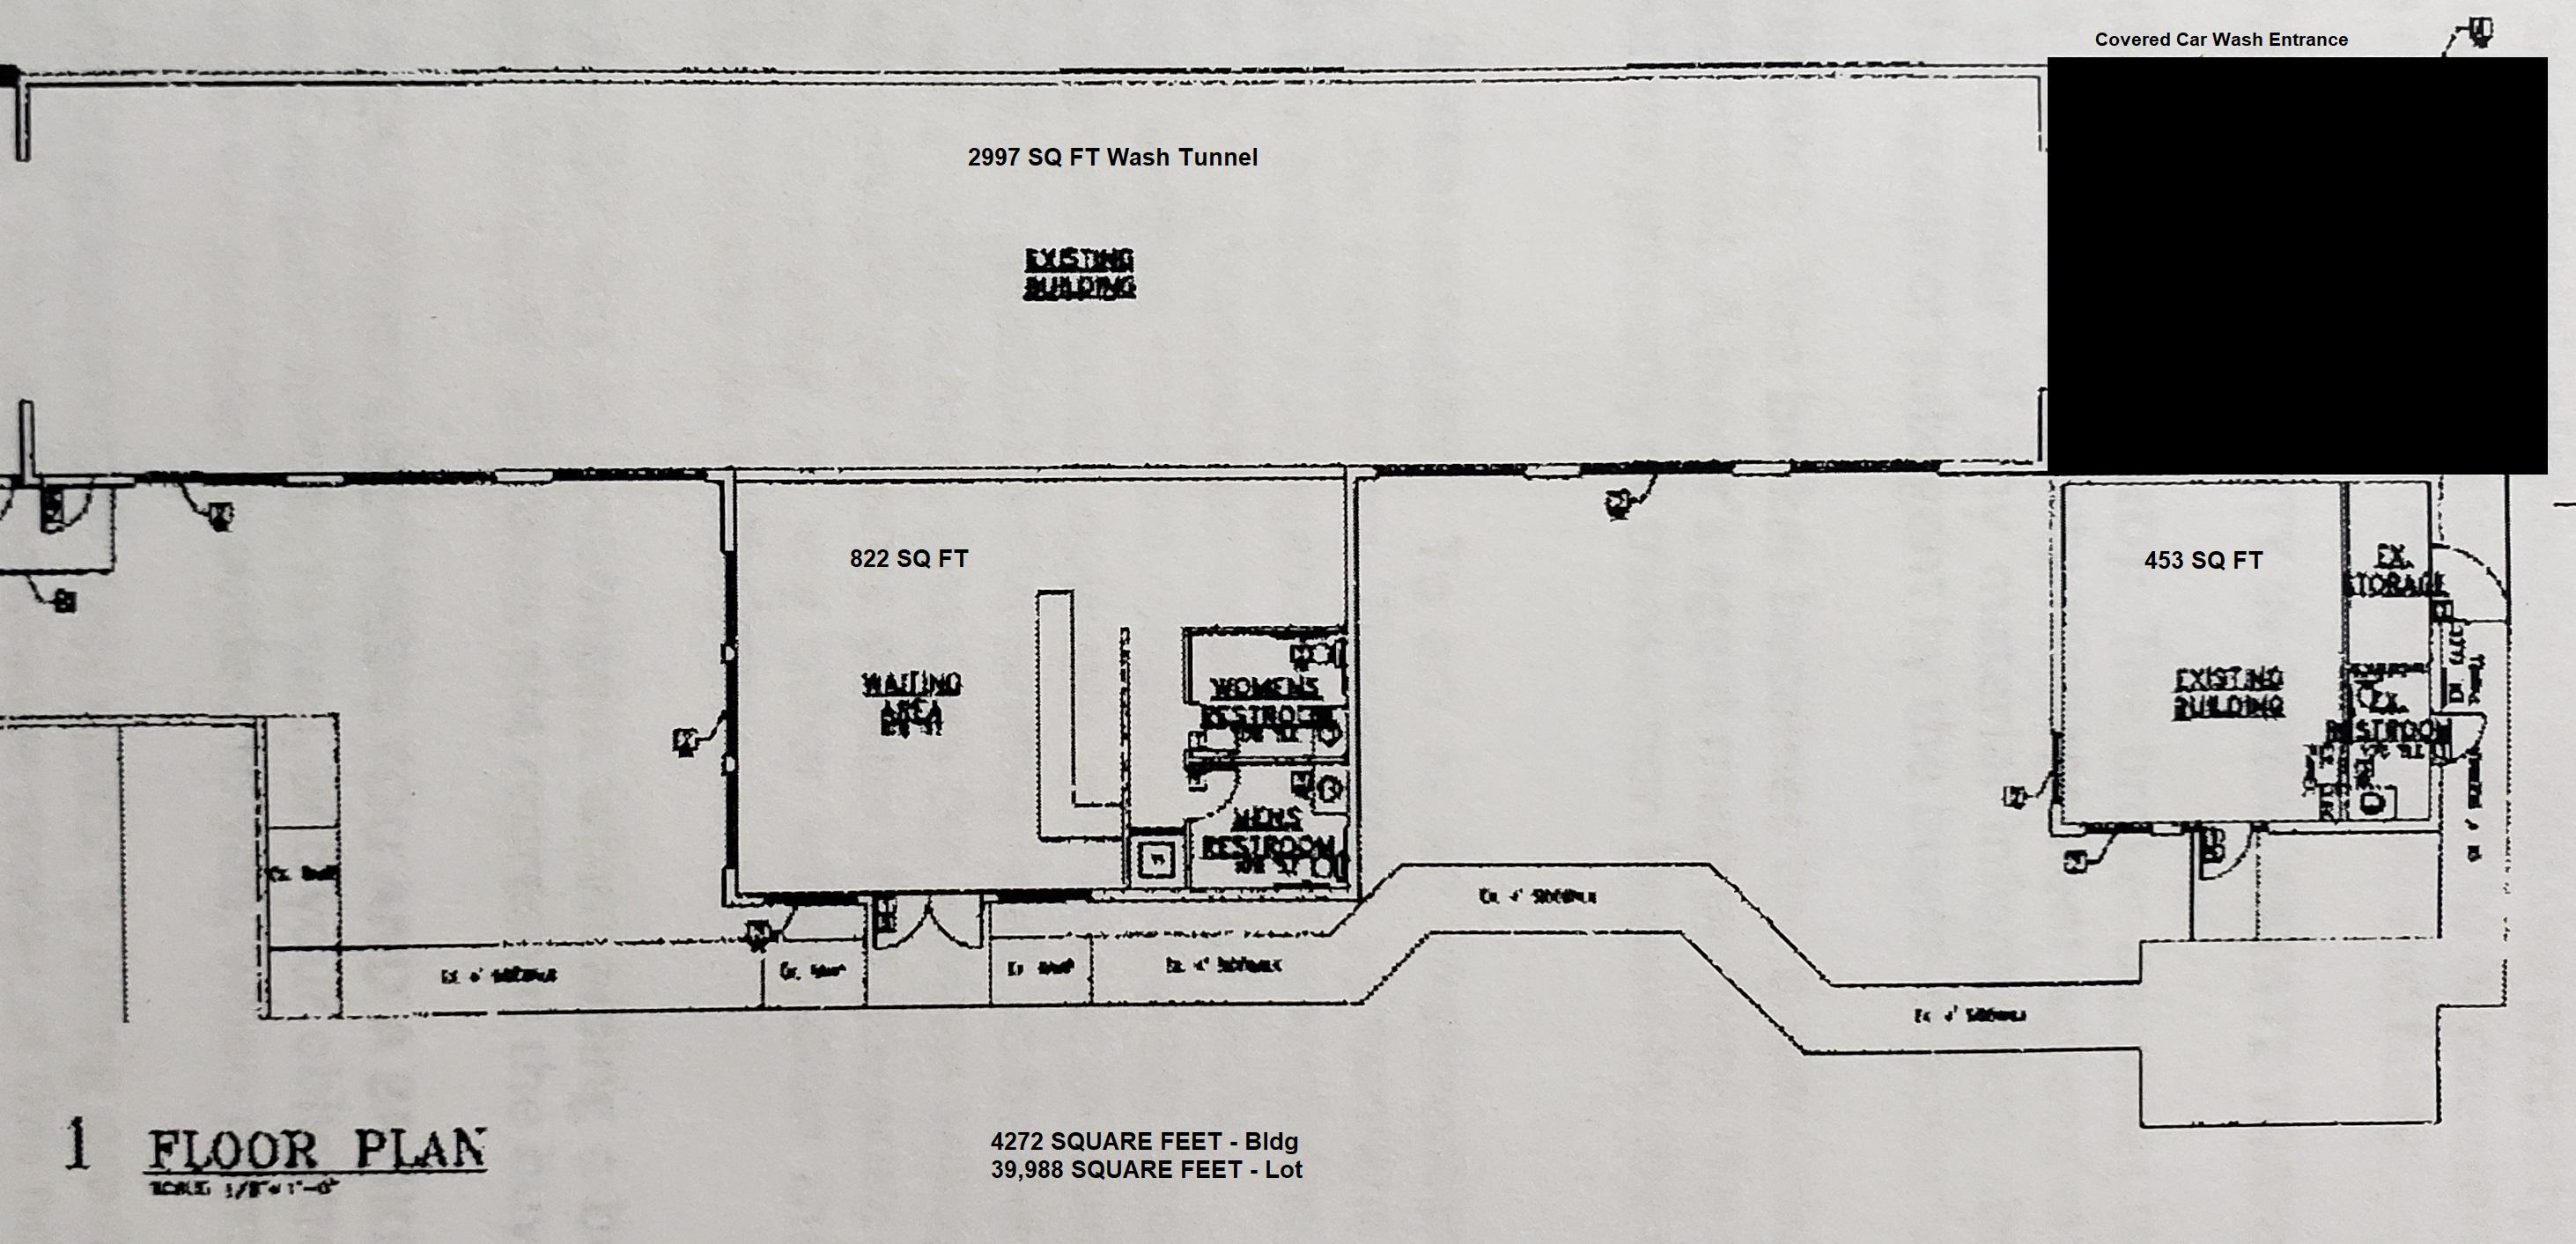 Floor Plan SF